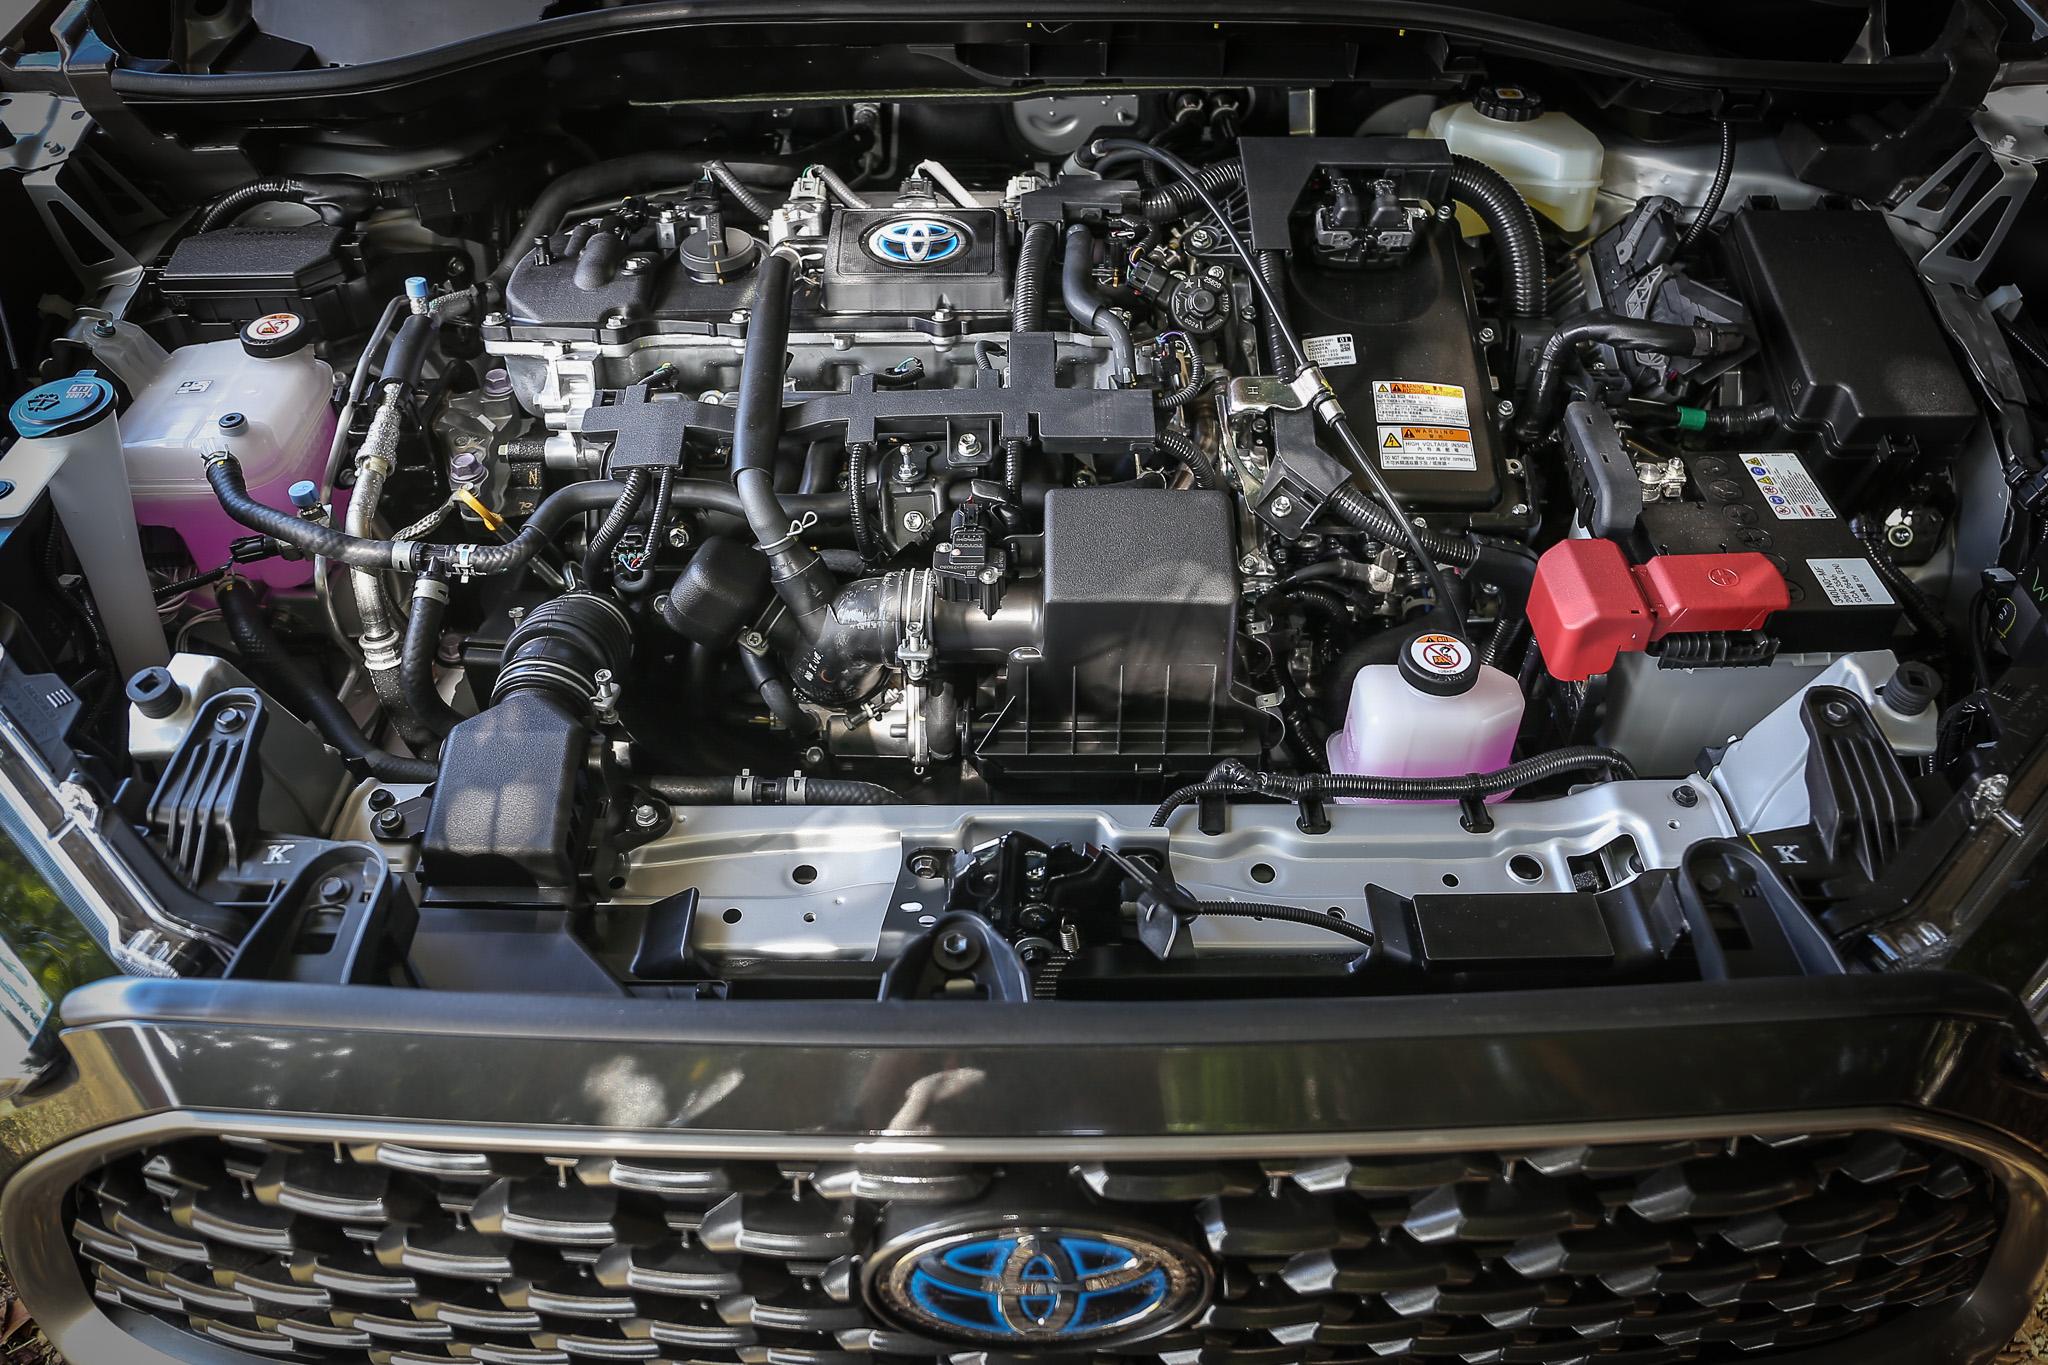 1.8L 油電版以 1.8 升直列四缸自然進氣汽油引擎為主體,配上電力驅動系統後,綜效輸出馬力為 122 匹。